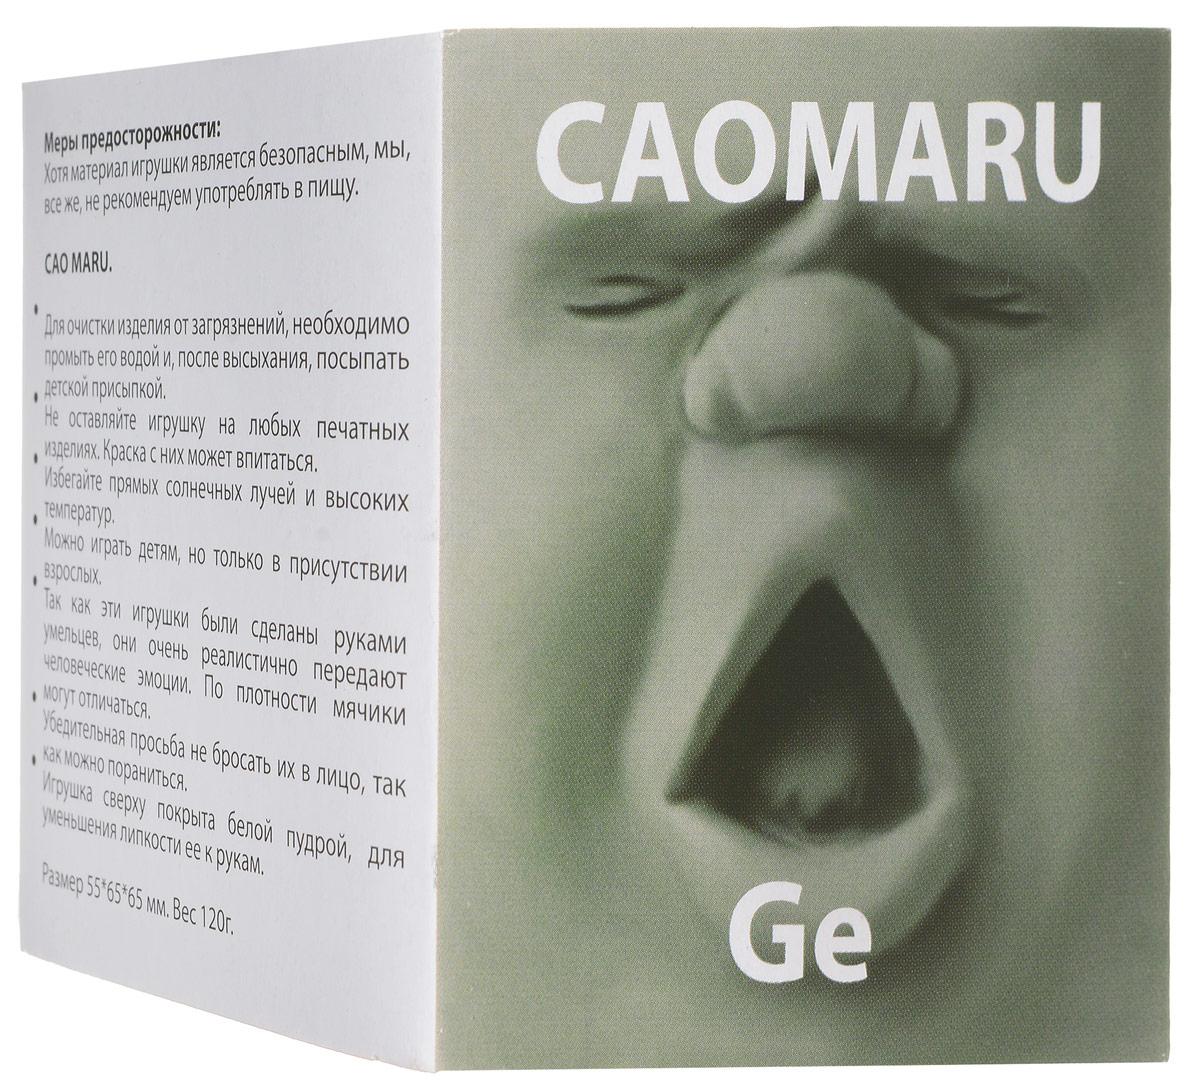 Cao Maru Стрессболл Ге